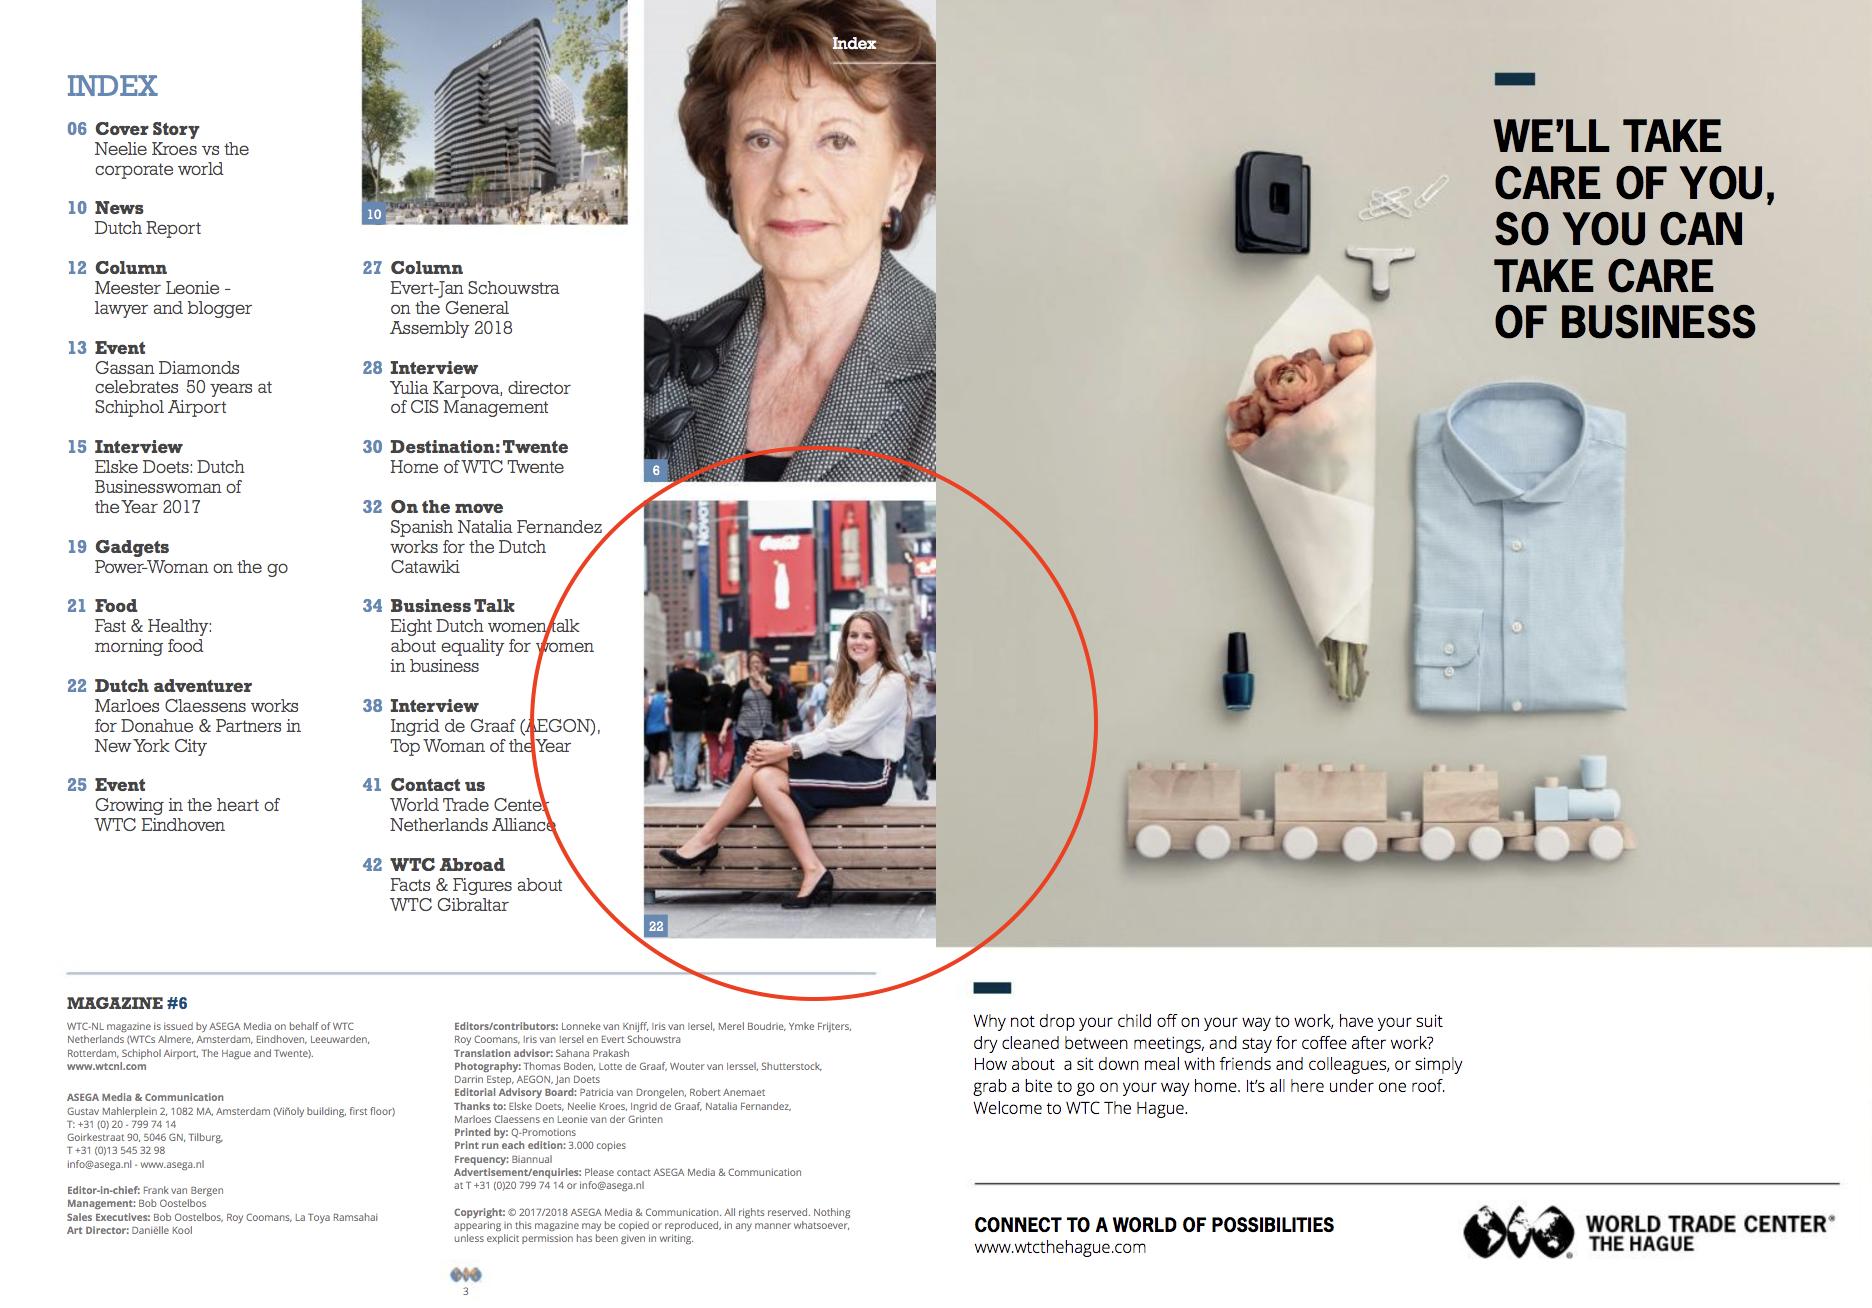 World Trade Center Netherlands Alliance Magazine #6 - TOC